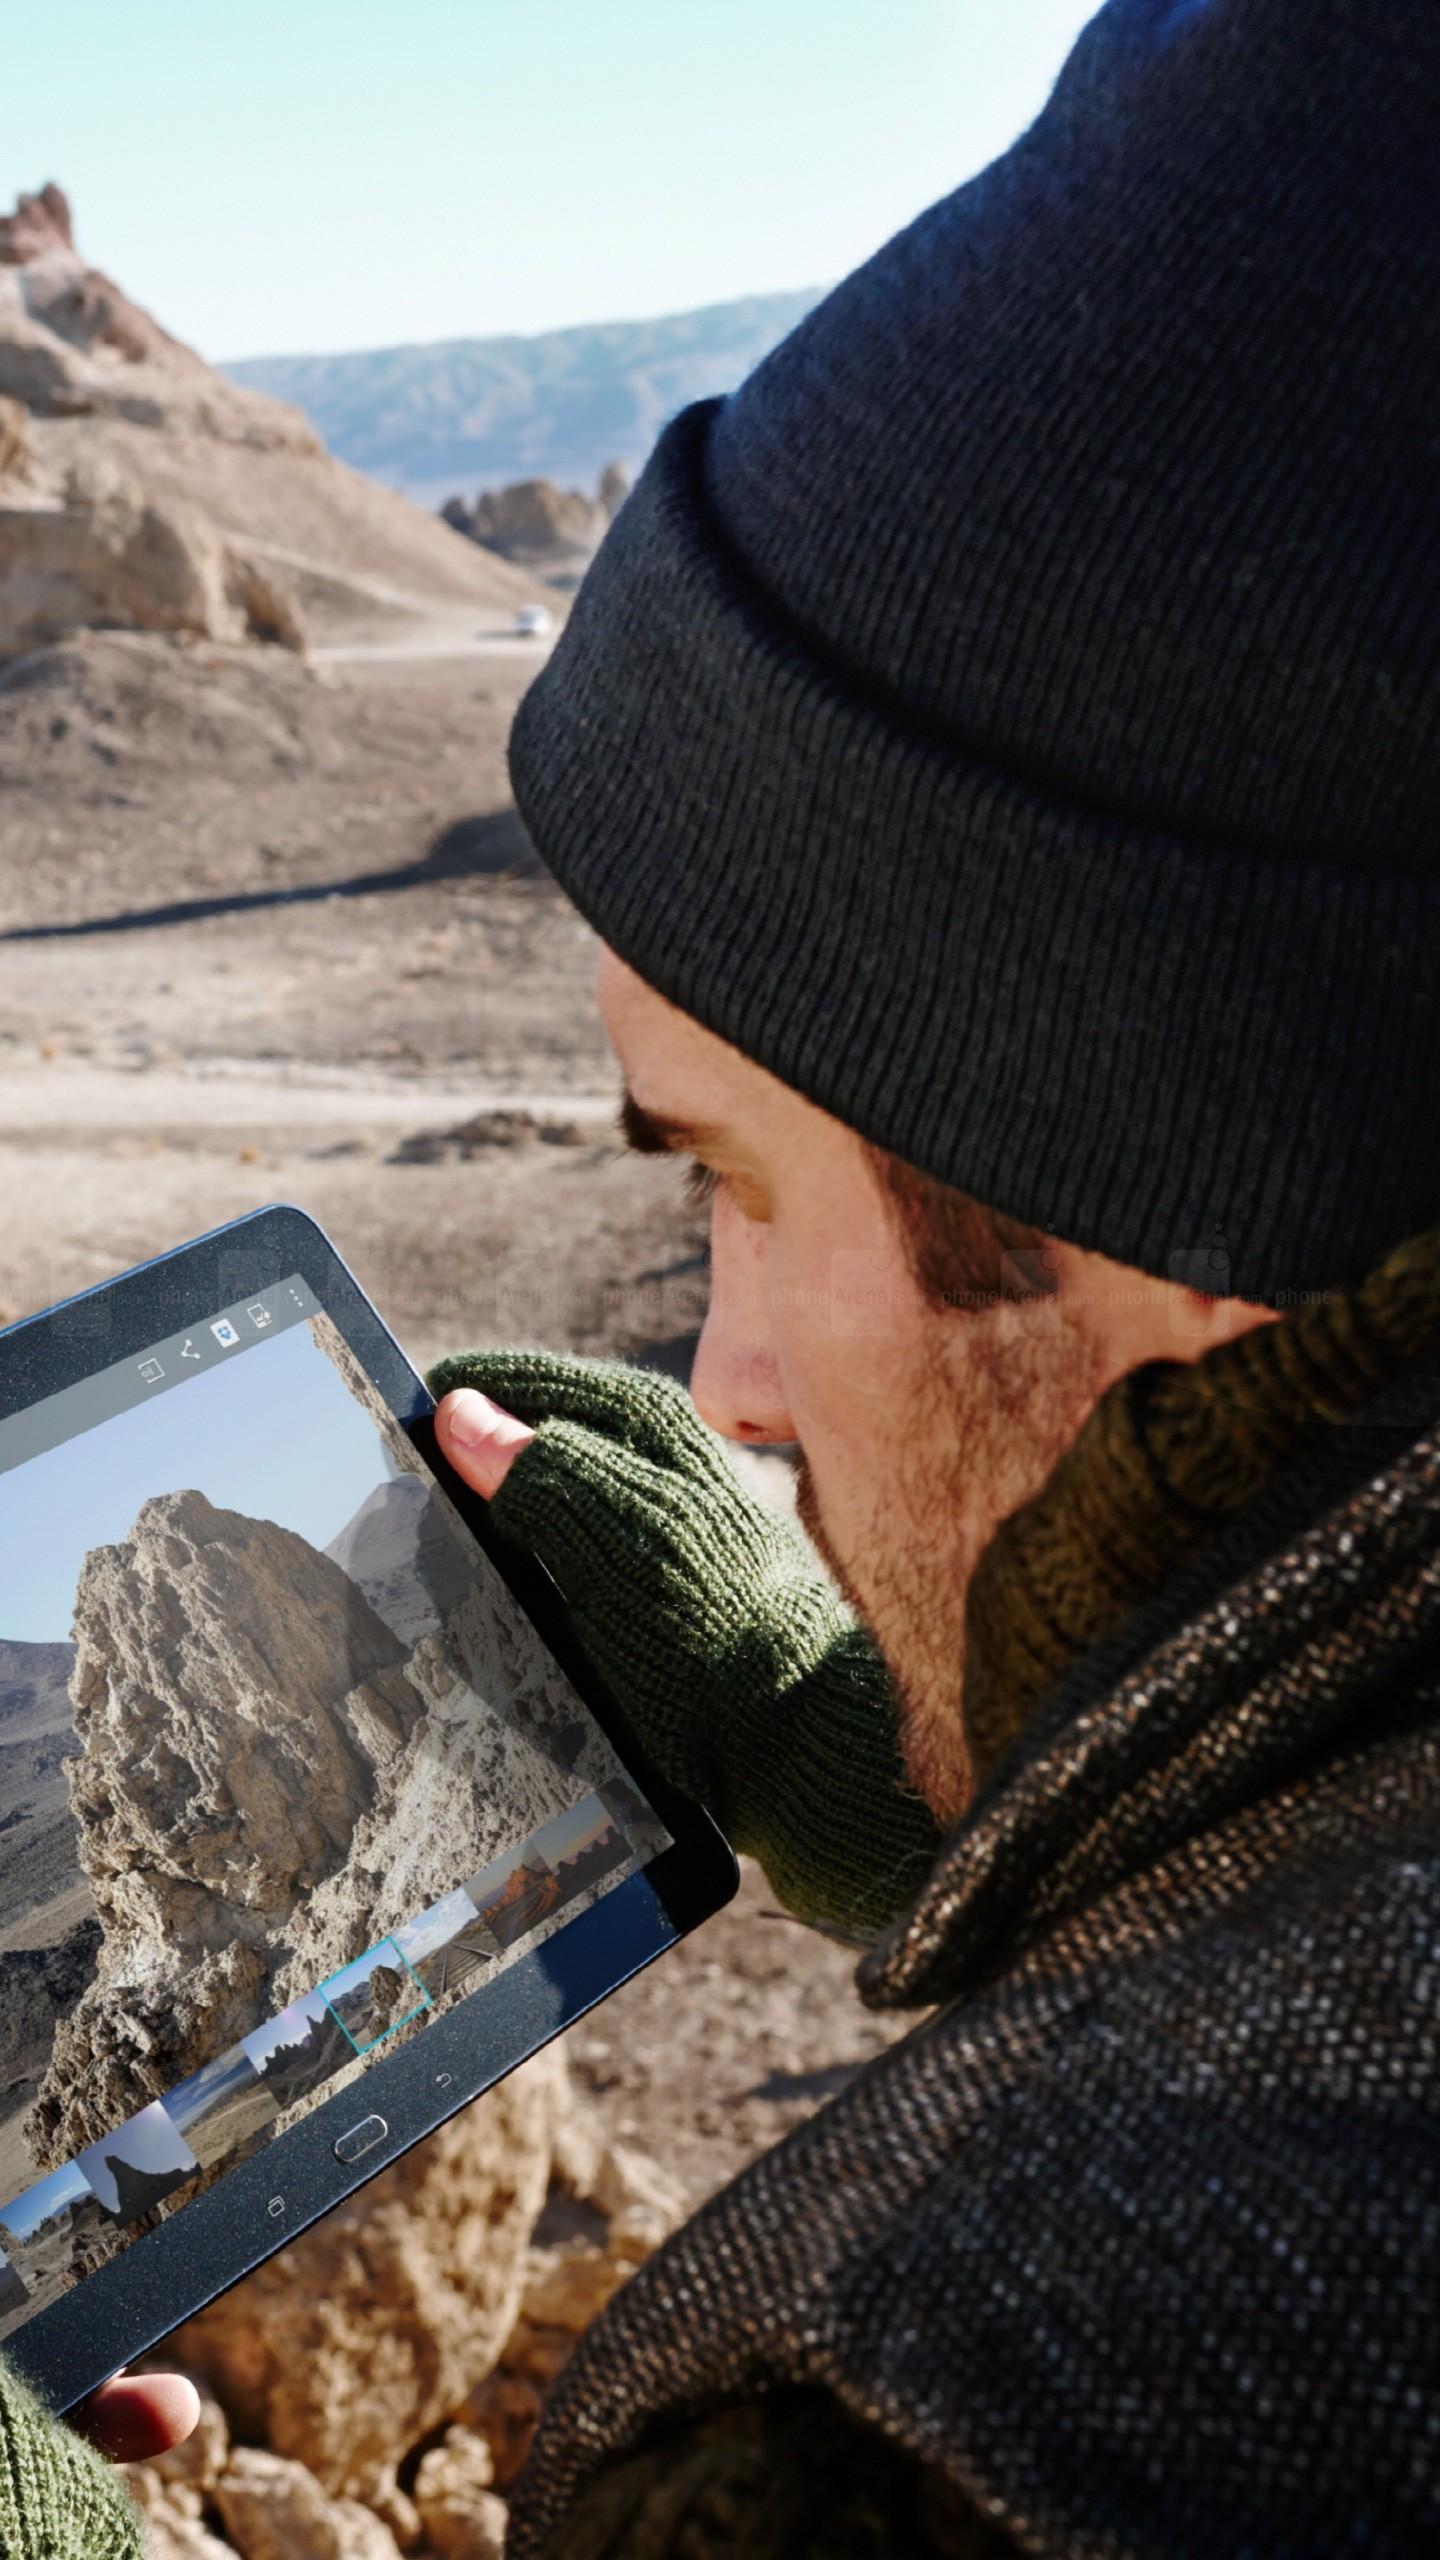 Wallpaper Samsung Galaxy Tab S Best Tablets 2015